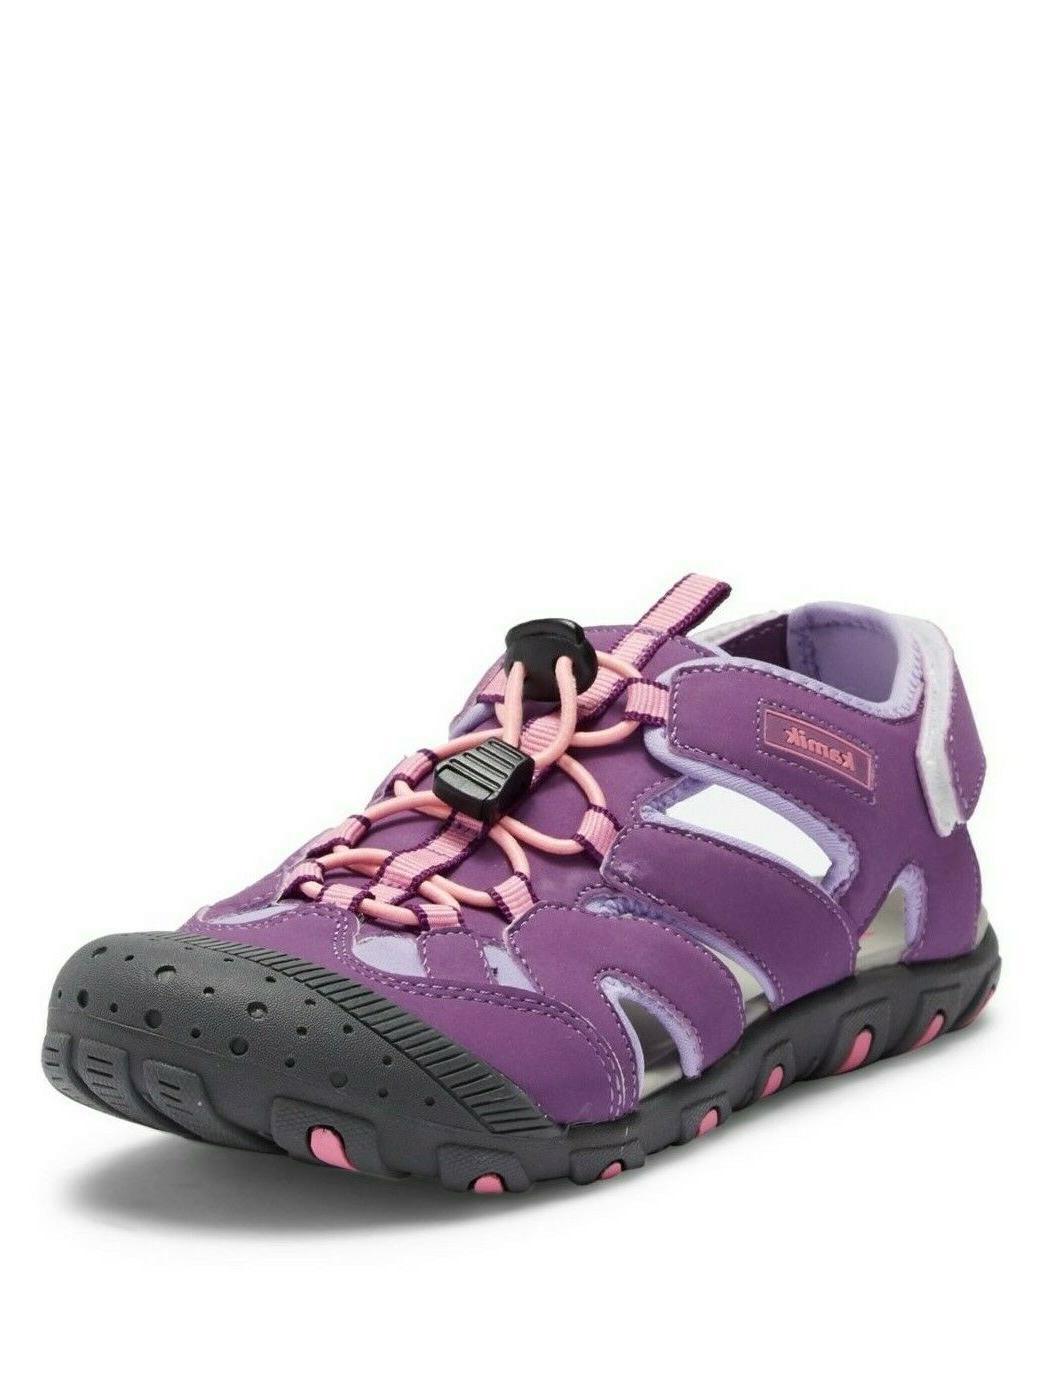 girls oyster waterproof water shoes purple big